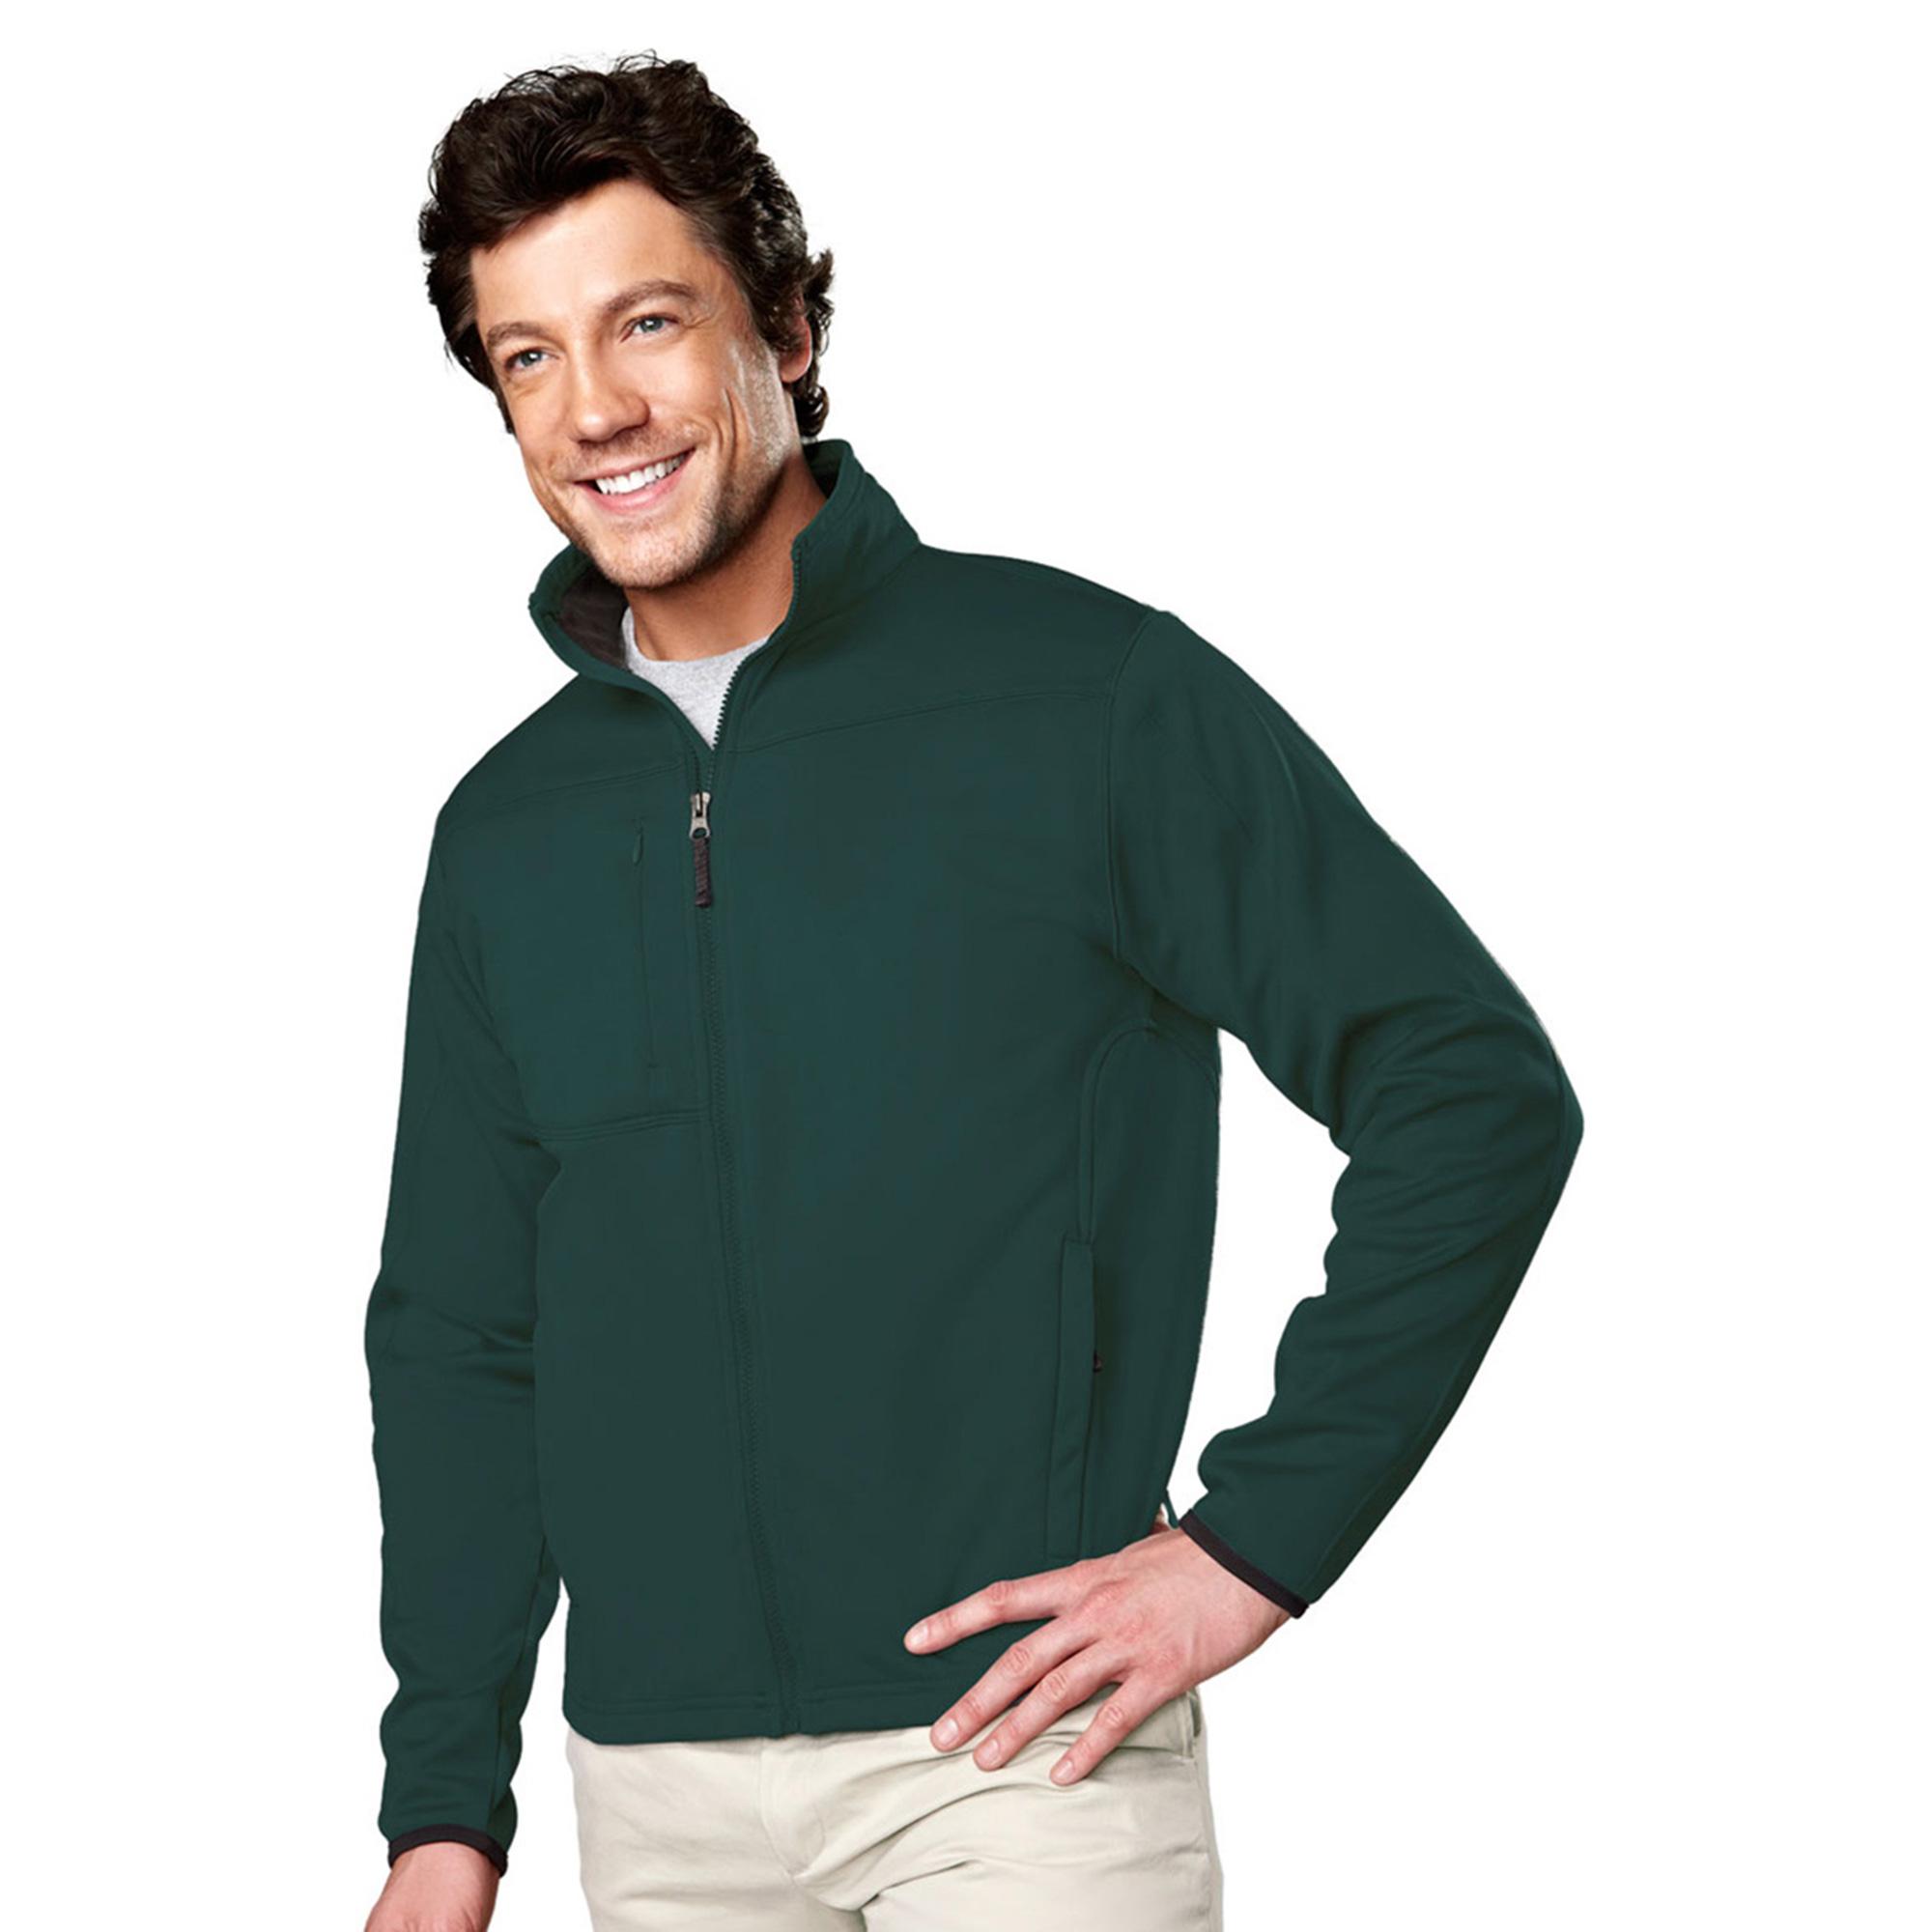 Tri-Mountain Men's Big And Tall Full Zip Fleece Jacket